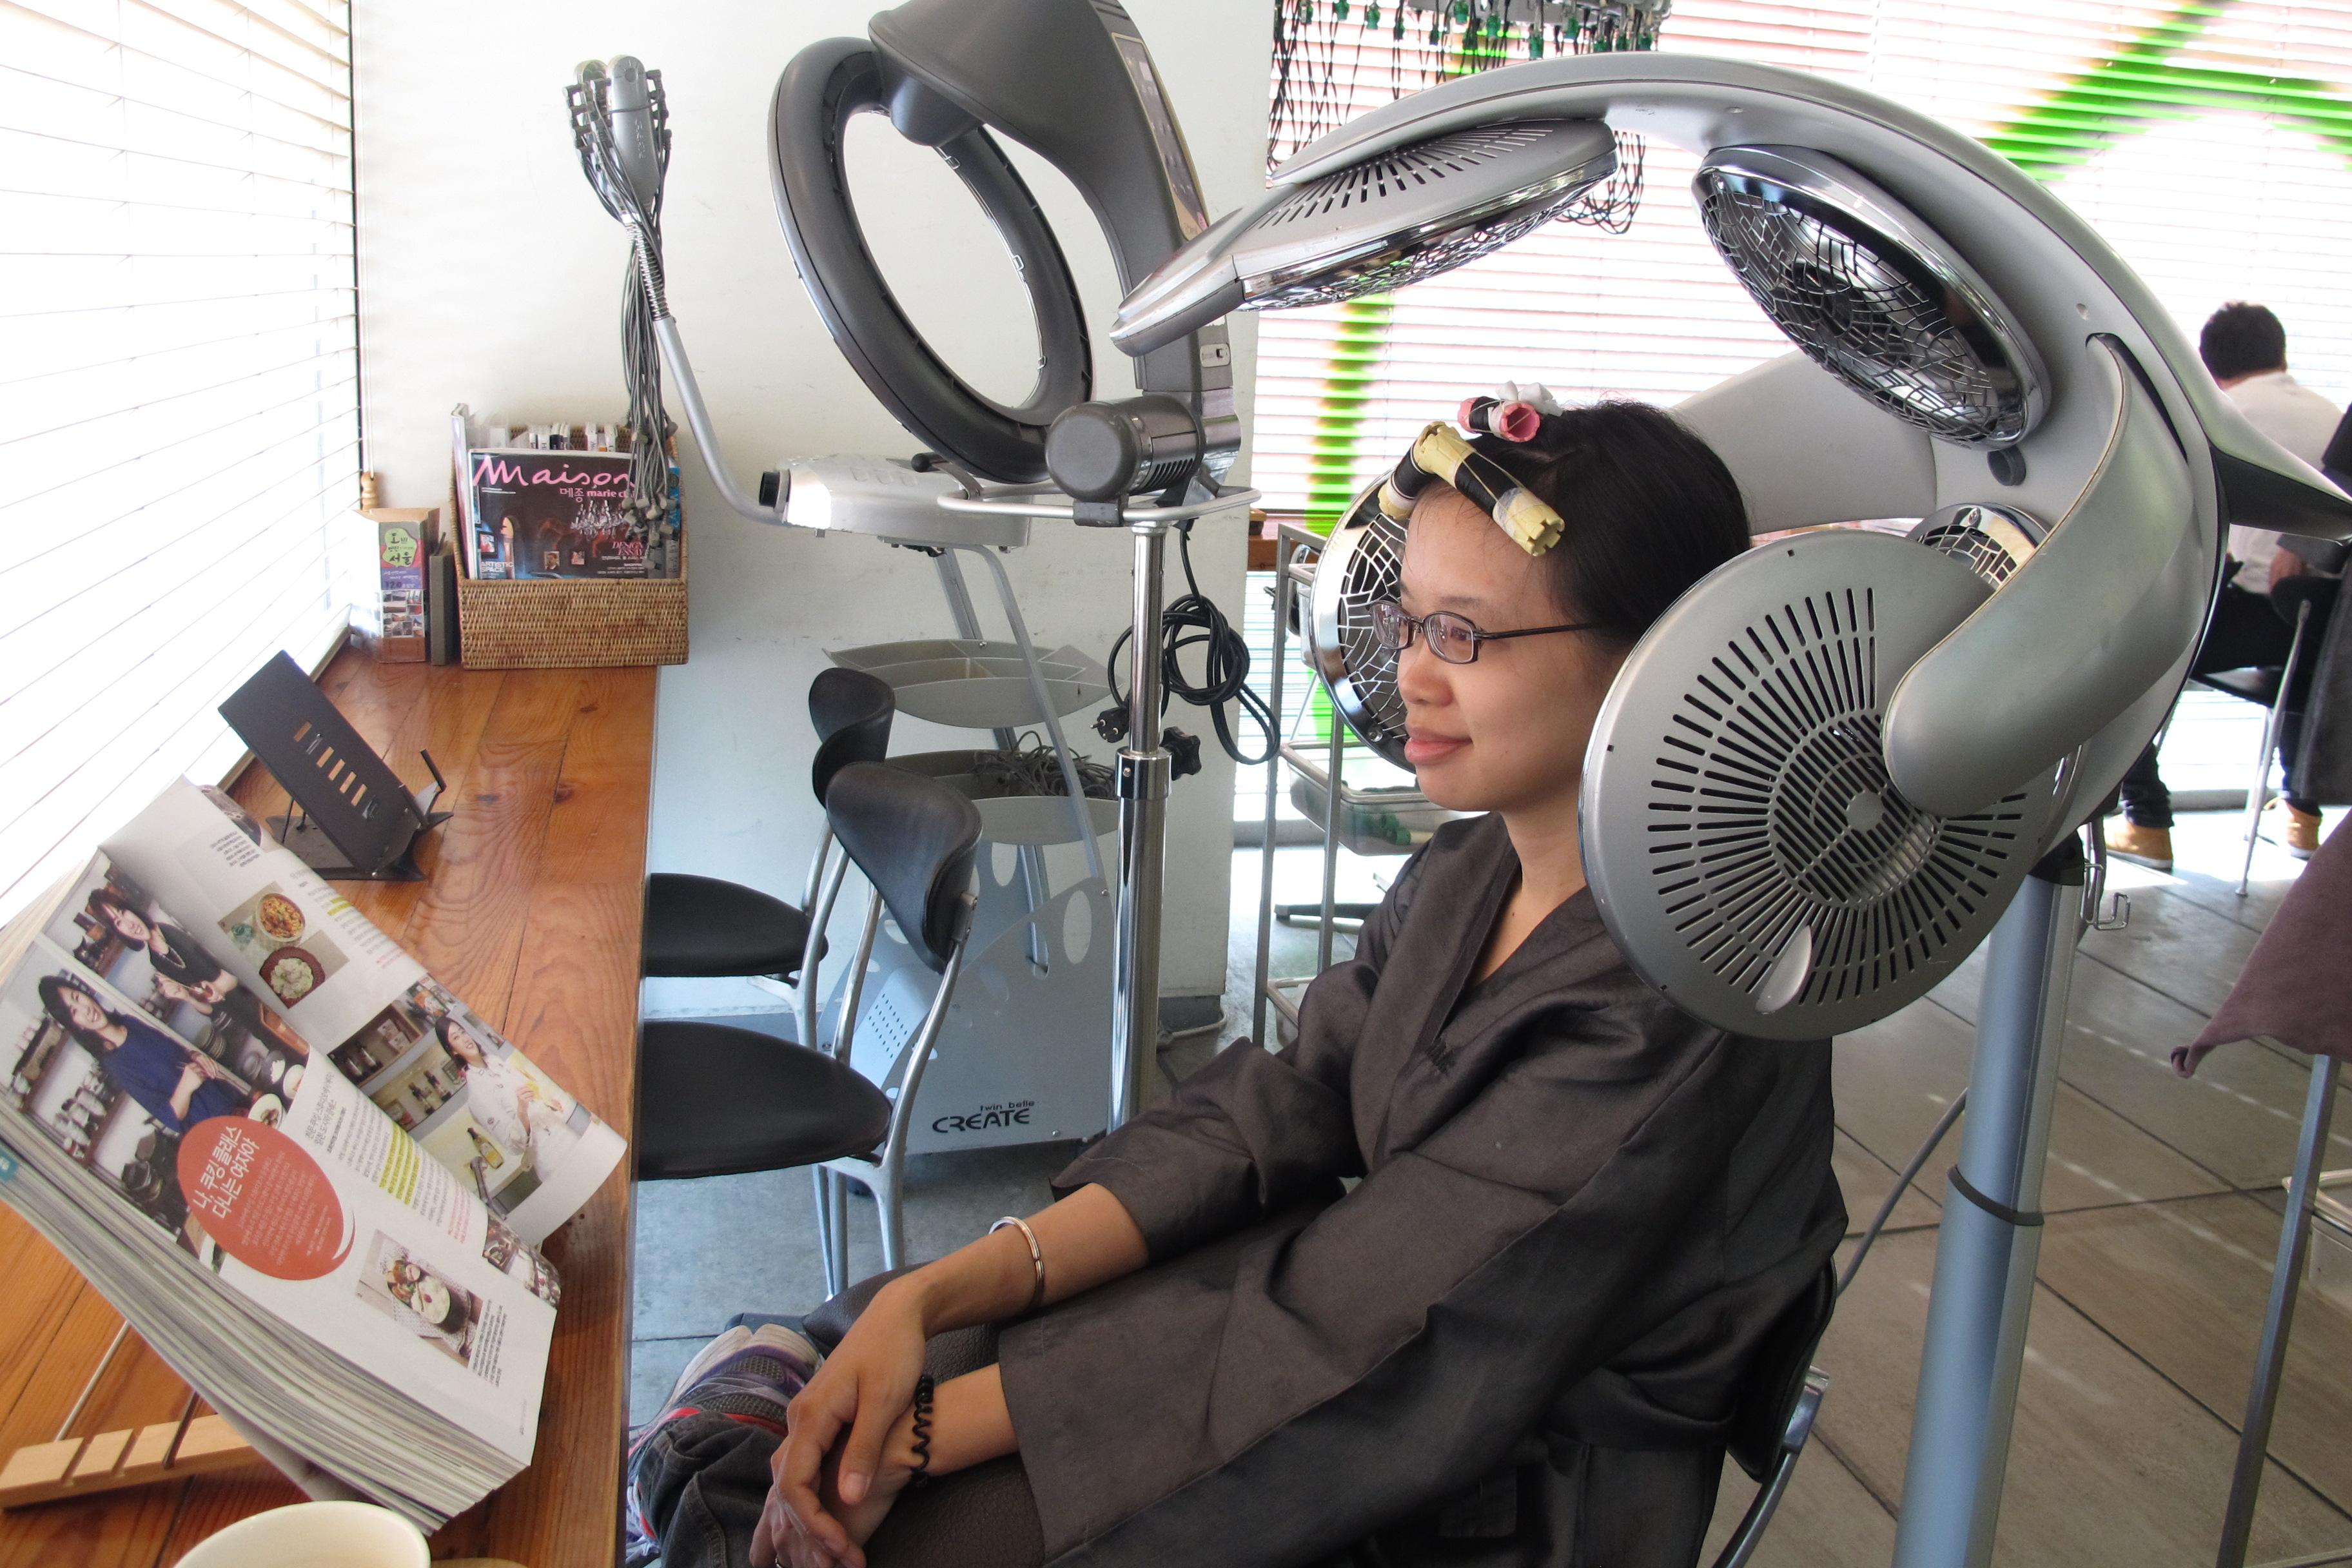 Make new glasses? Get a hair cut?